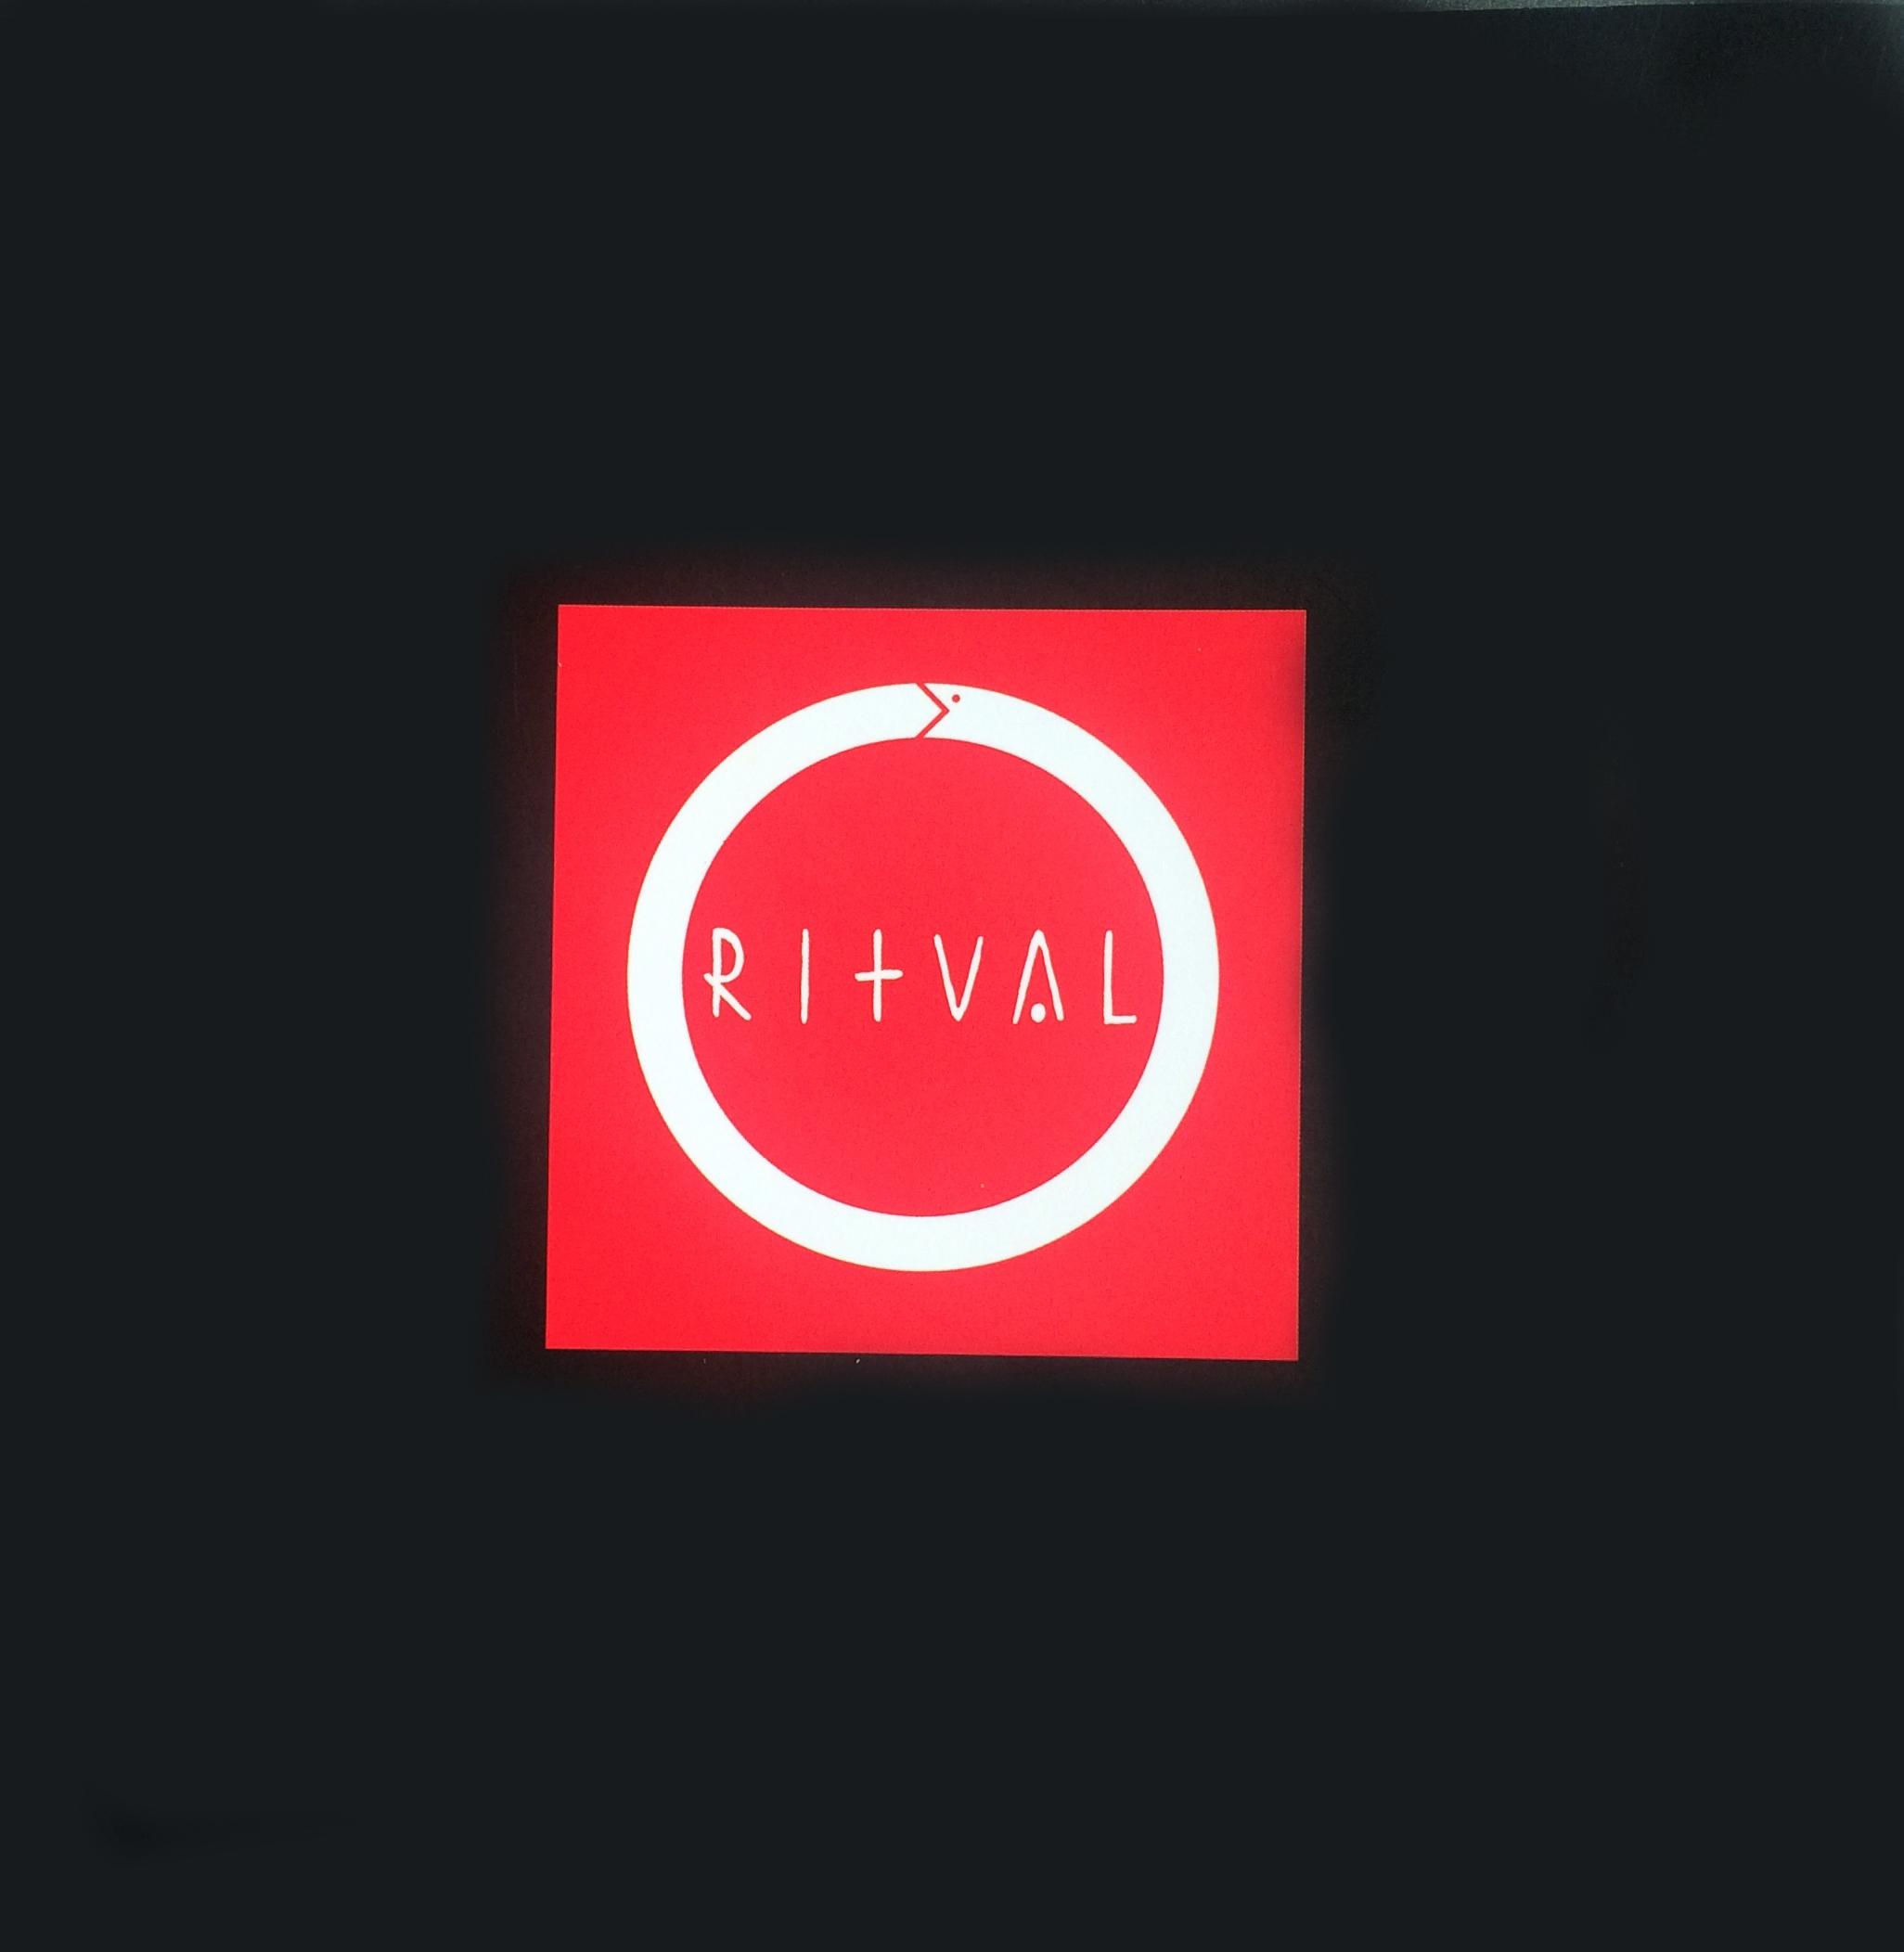 ritual cover.jpg